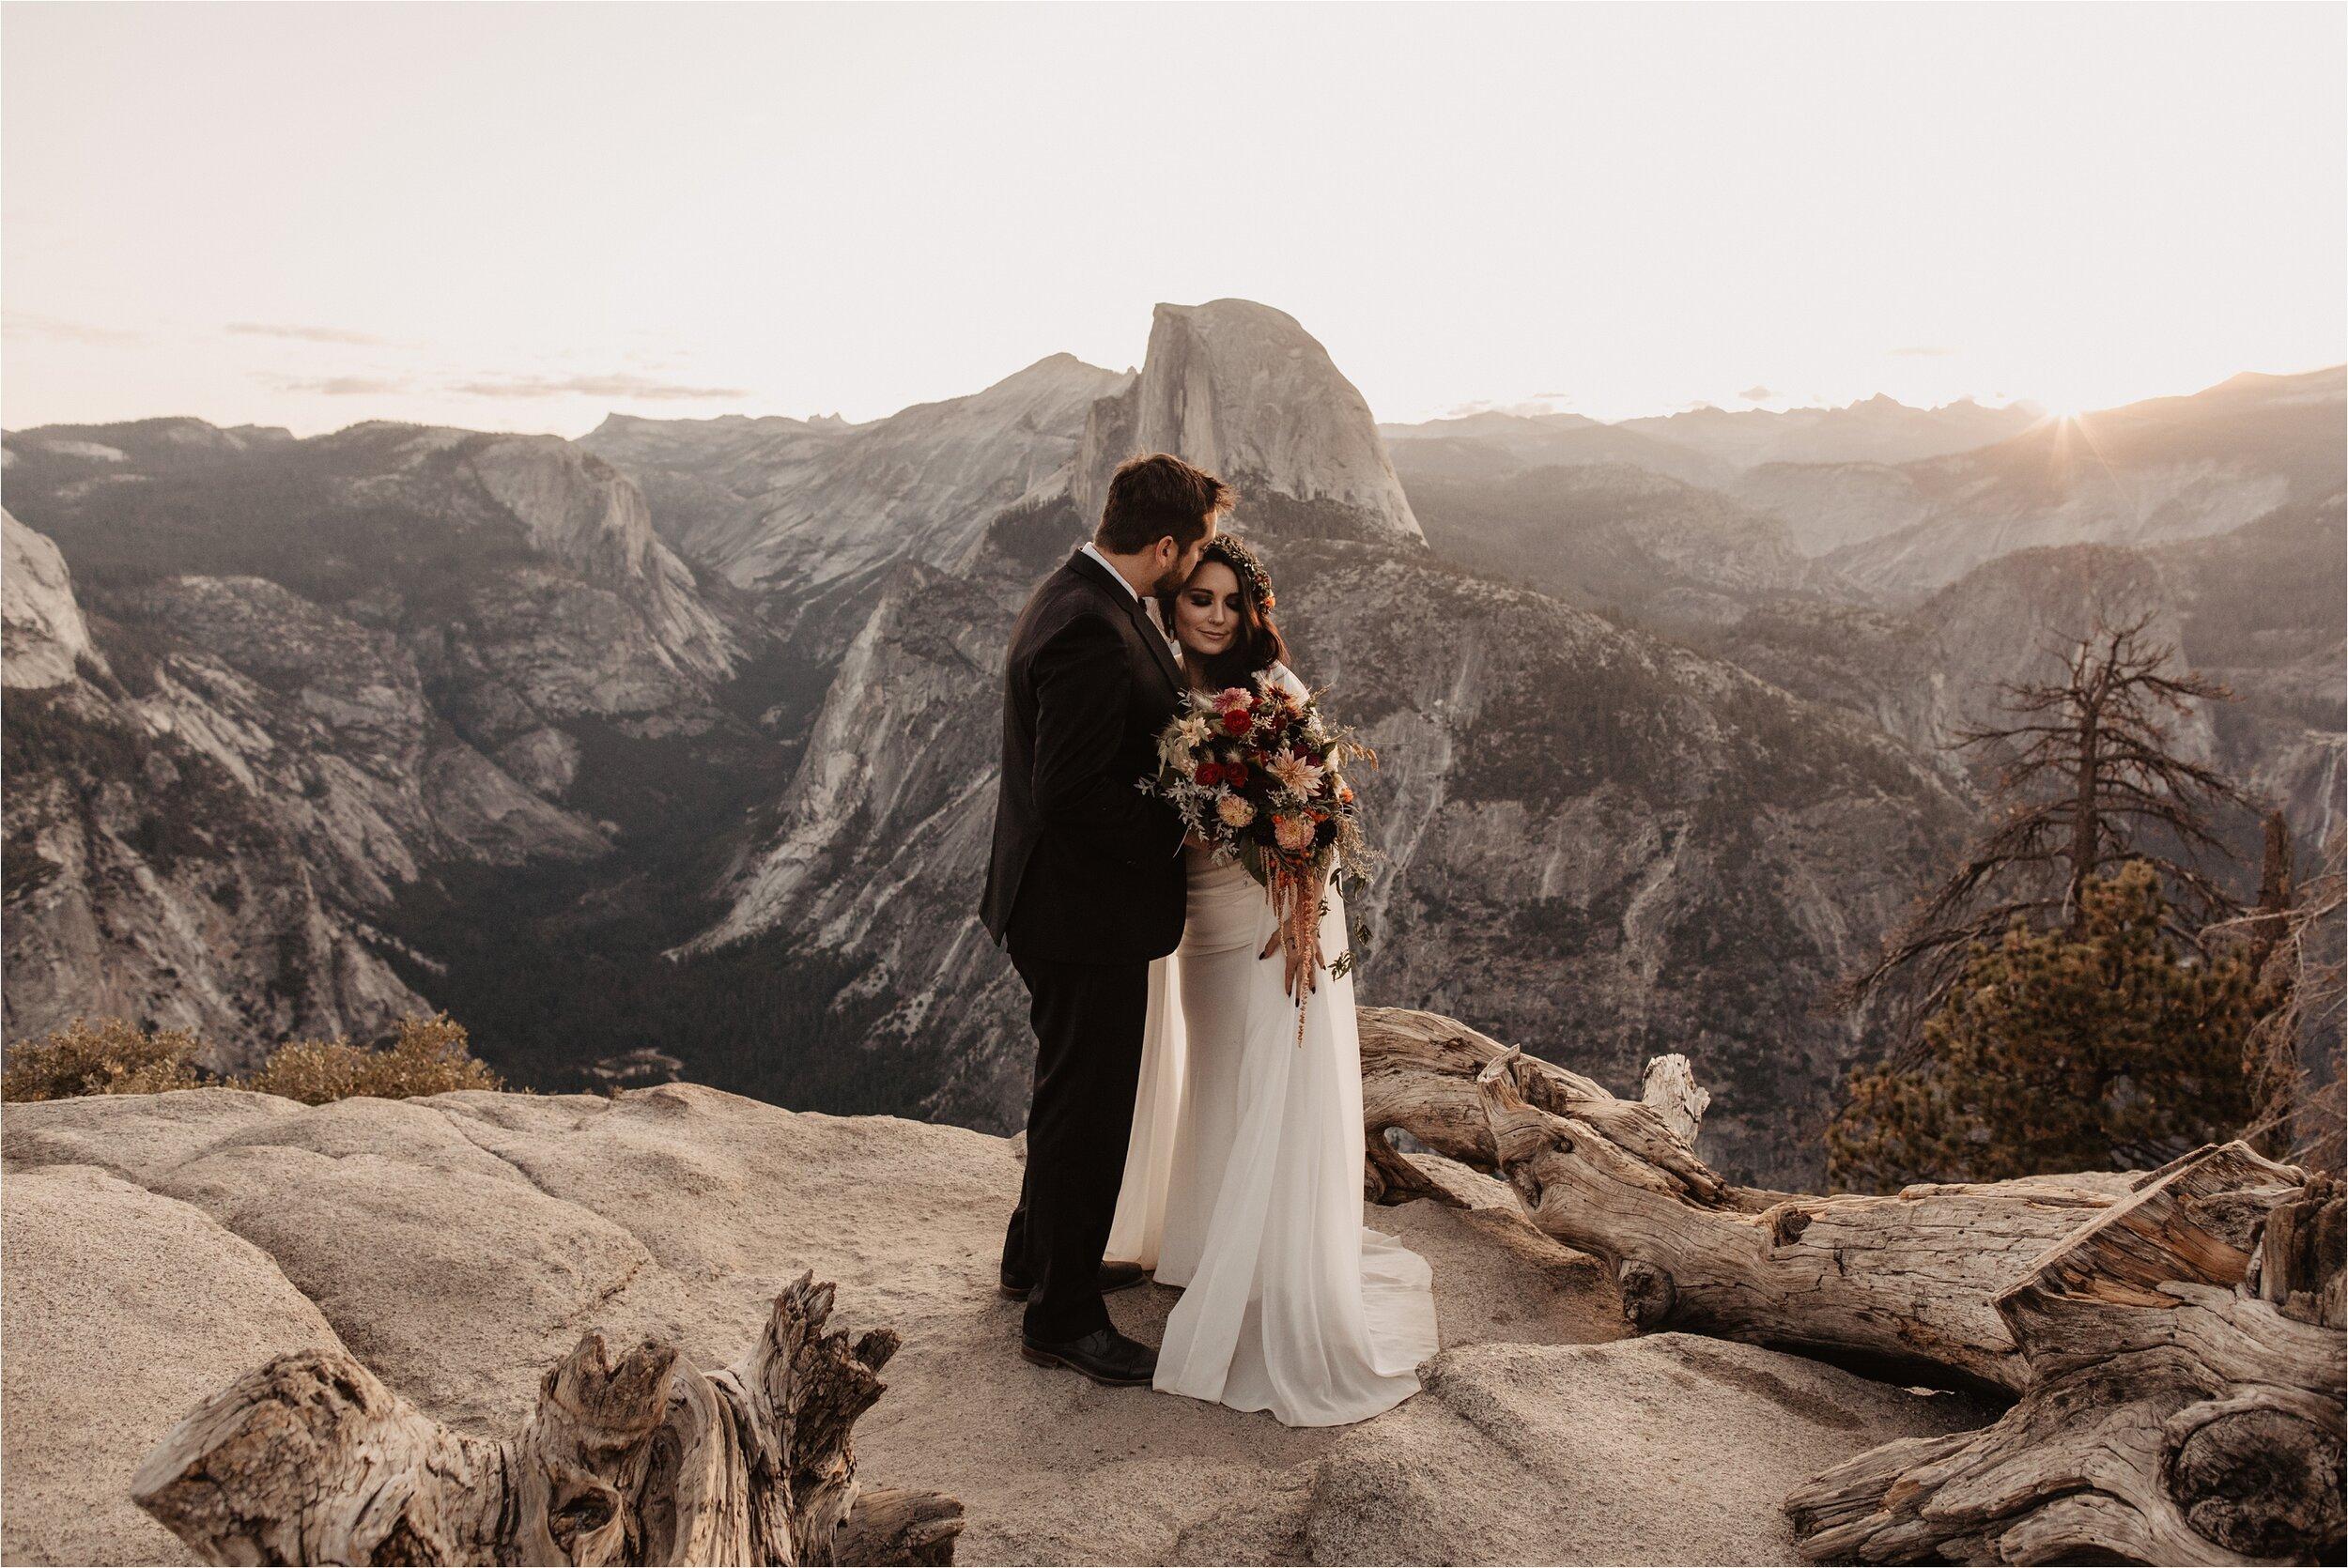 glacier-point-yosemite-elopement-ceremony_0020.jpg